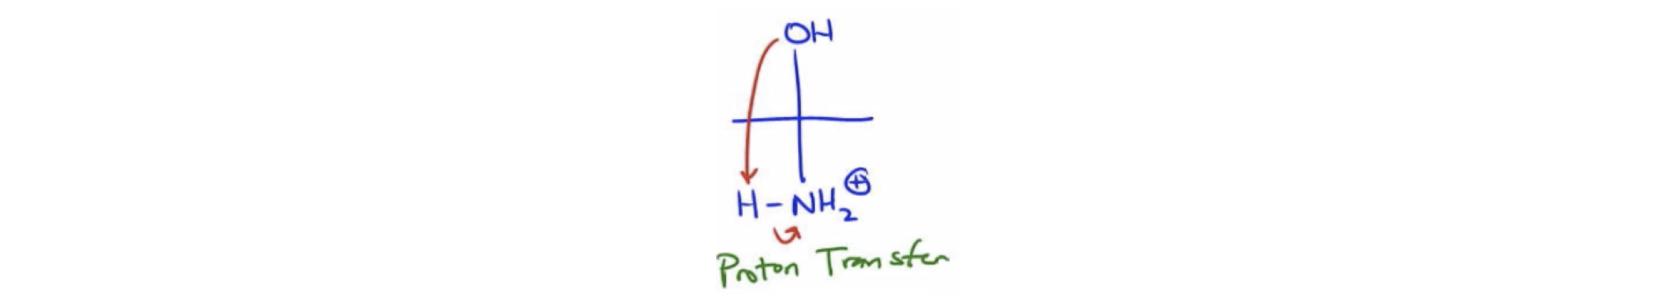 Proton-Transfer-Step